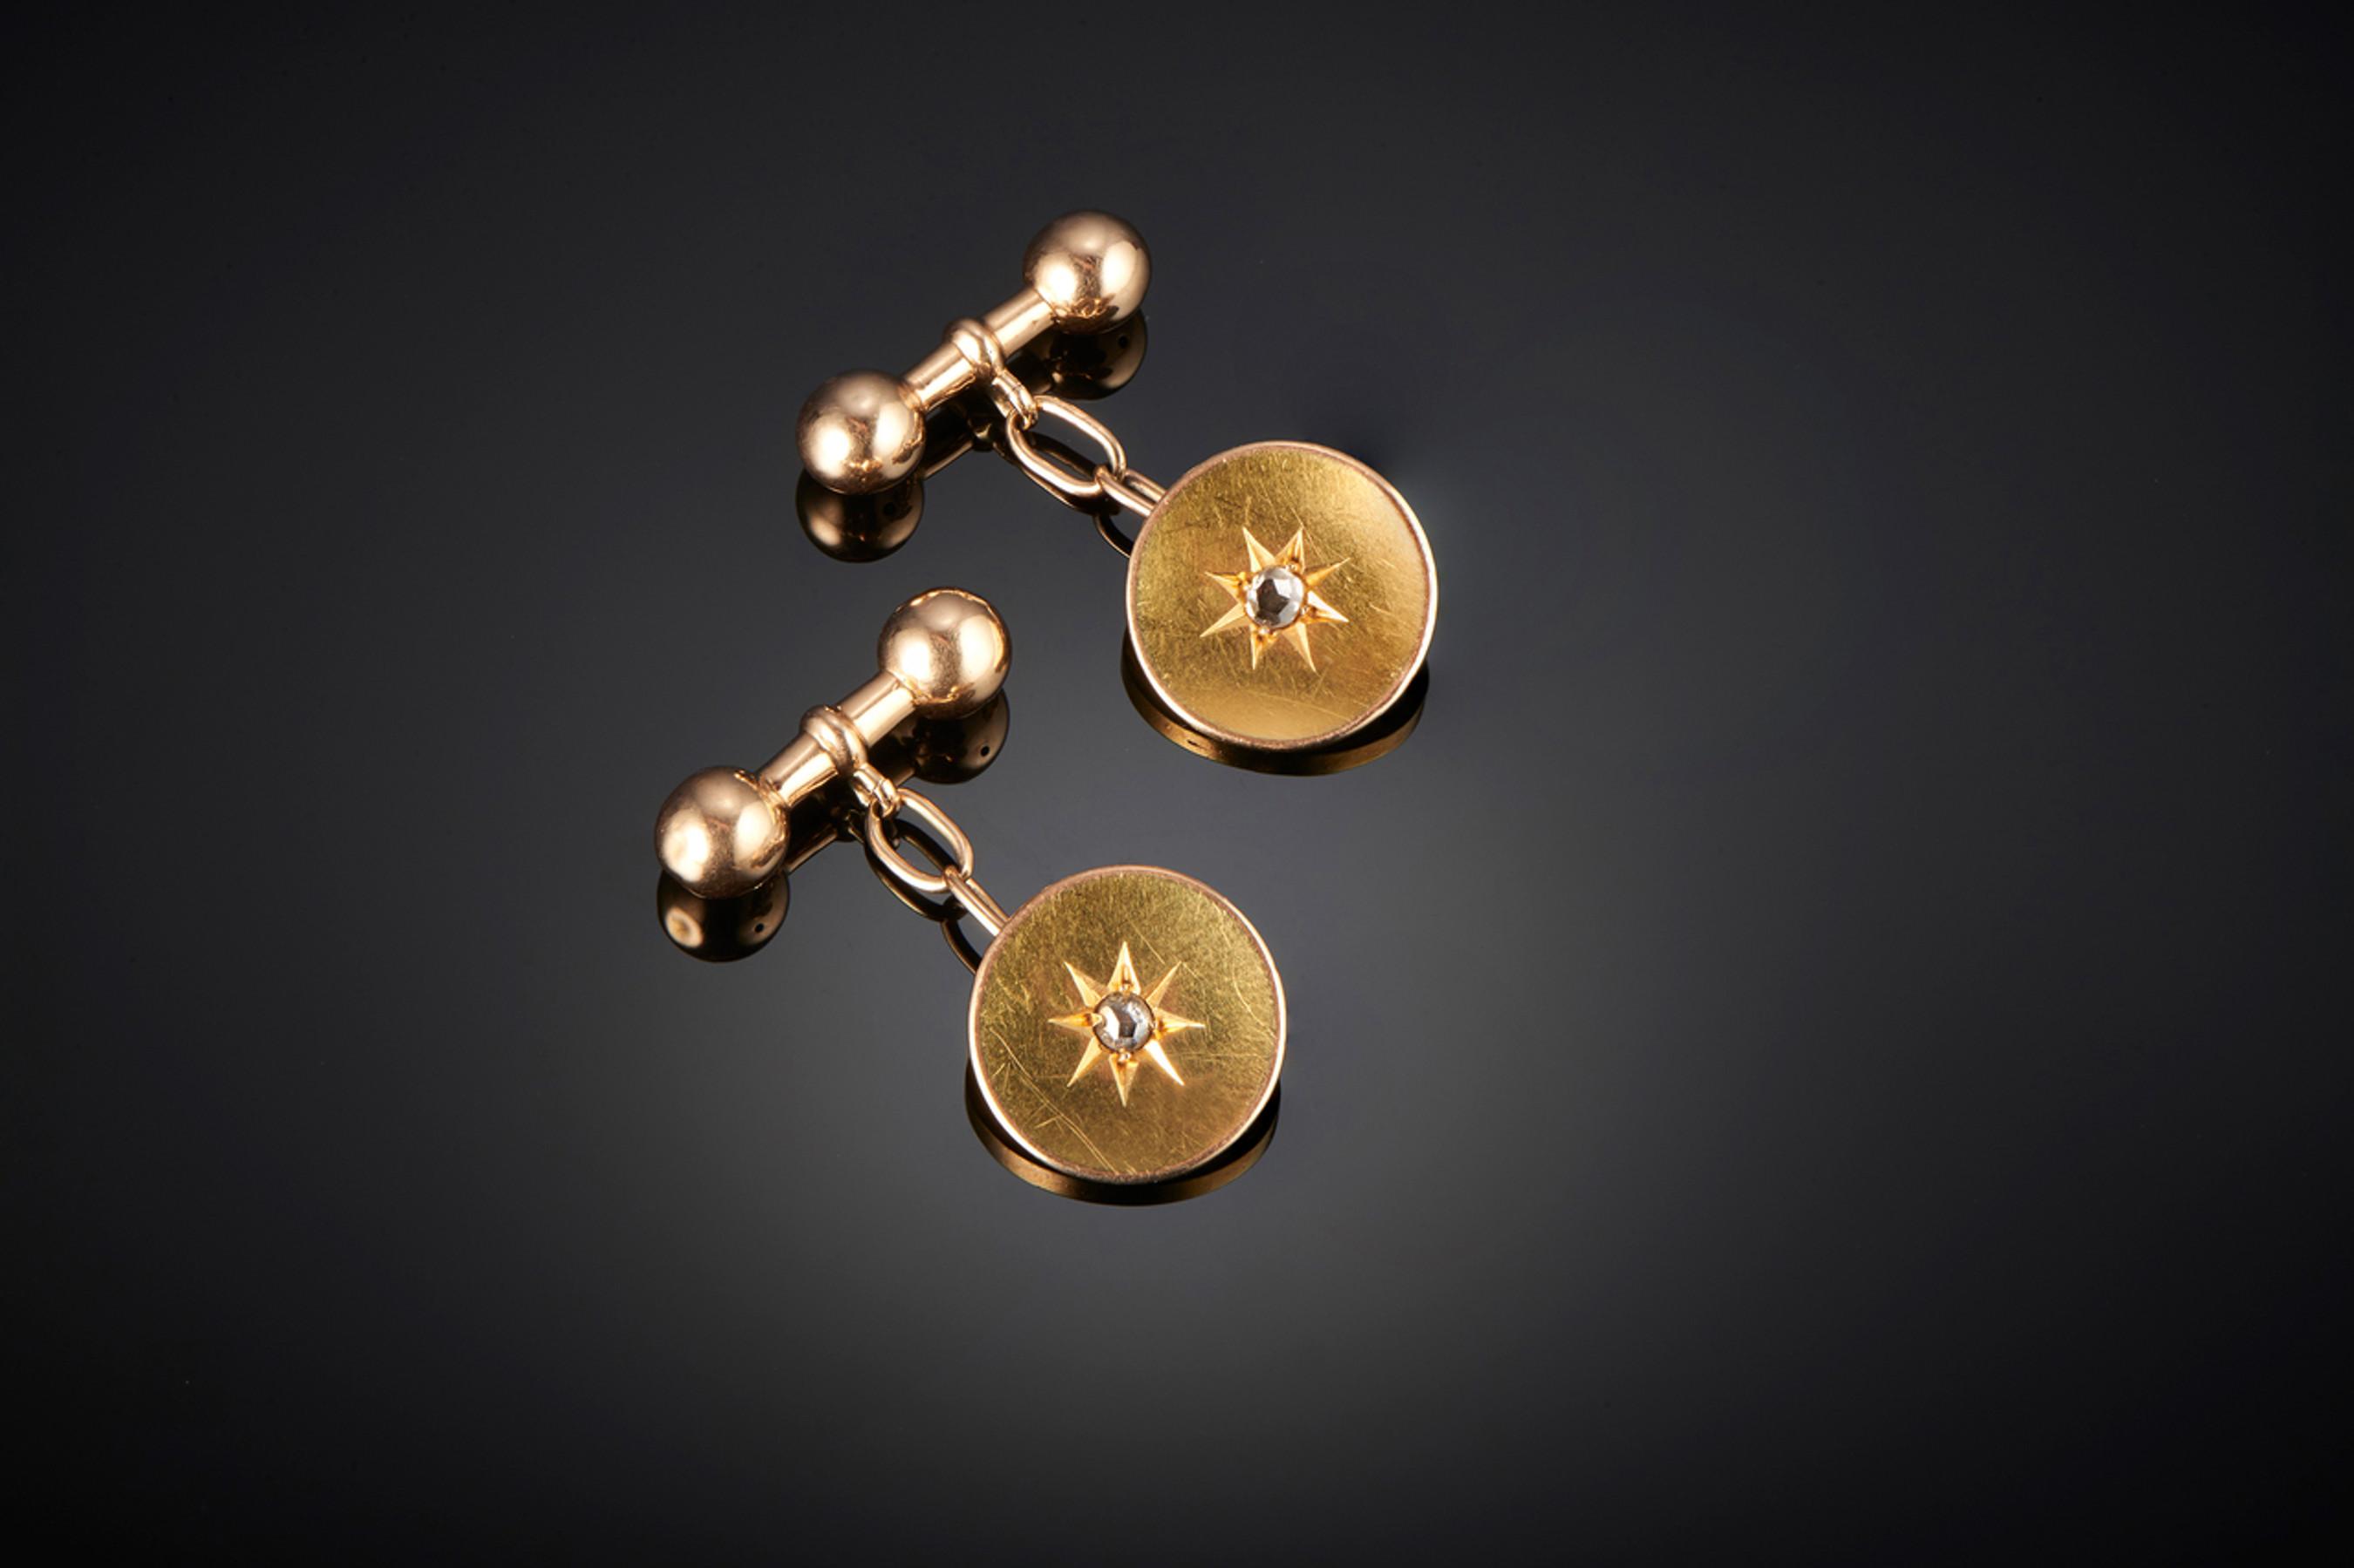 Elegant Pair of Diamond set Gold Cufflinks - Front Image